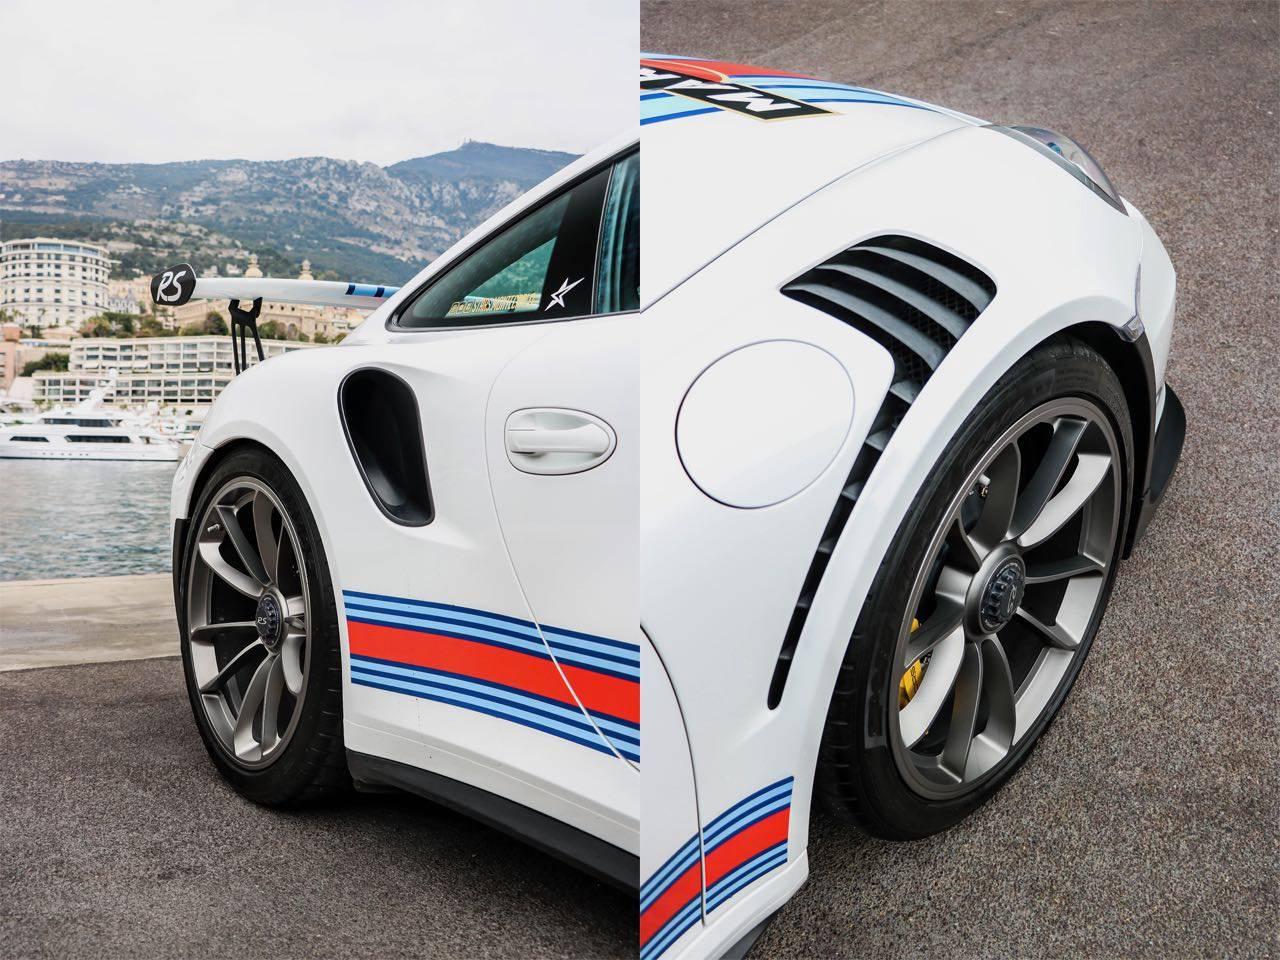 Porsche-991-Coupè-991-PDK-GT3-RS-Martini-13